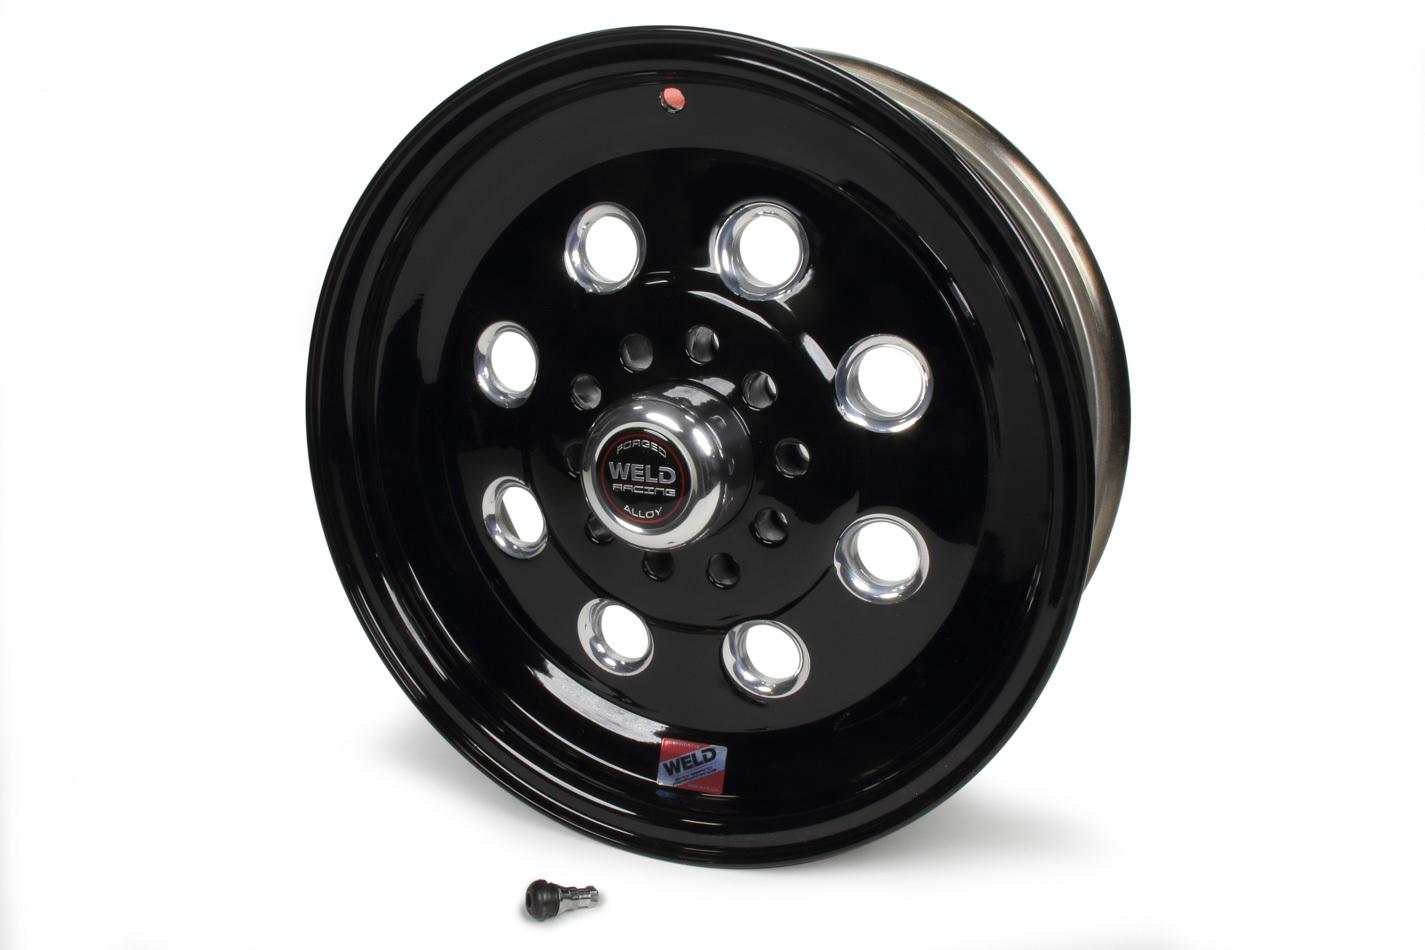 WELD RACING 15 X 6 Draglite Wheel 5 X4.5-4.75in. 3.5in. BS P/N - 90B-56346